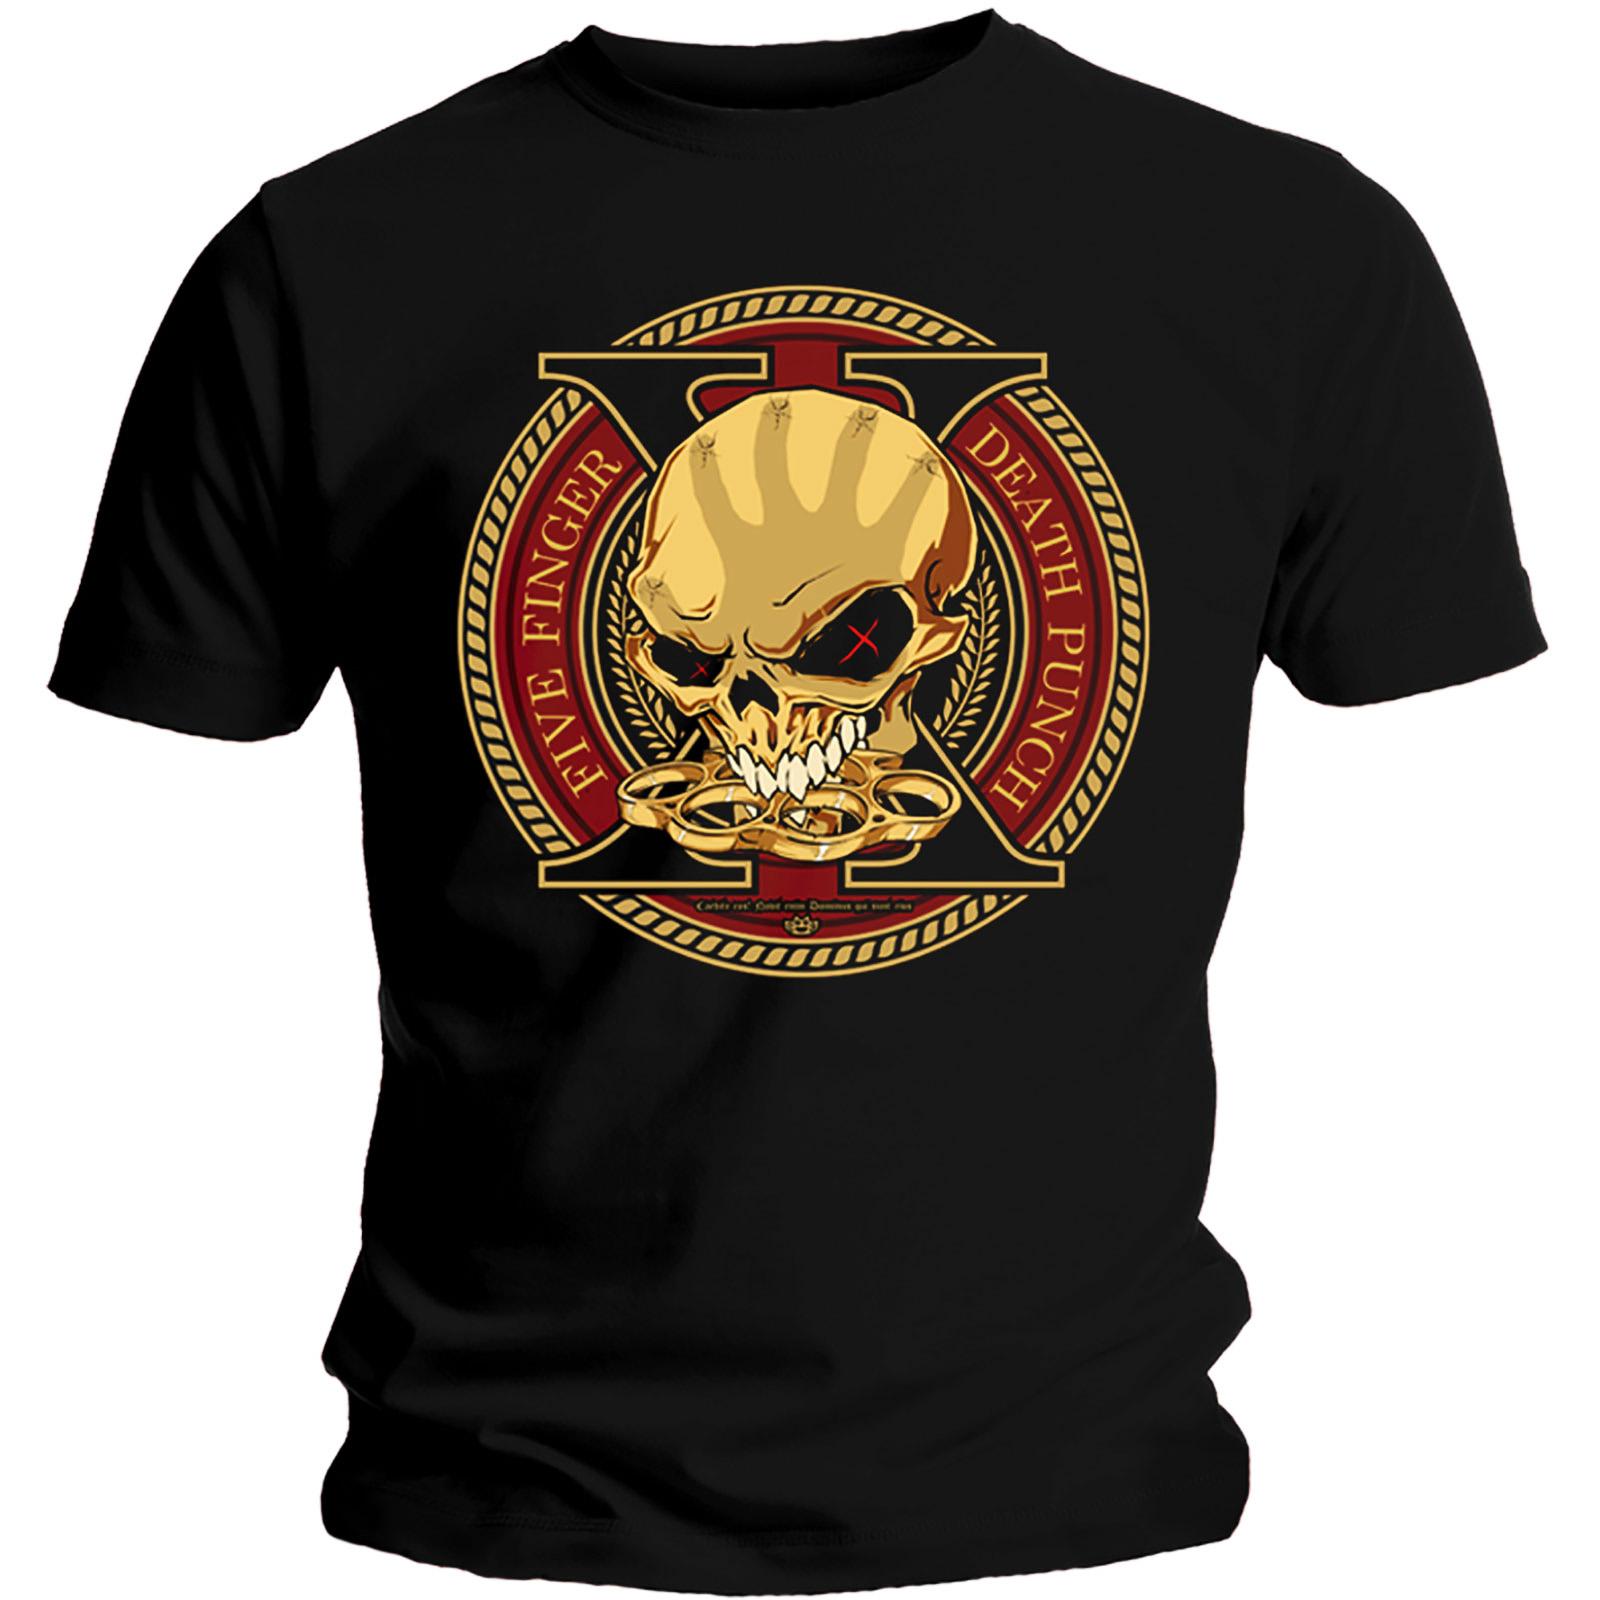 Official-T-Shirt-Five-Finger-Death-Punch-Album-DECADE-of-Destruction-All-Sizes thumbnail 3